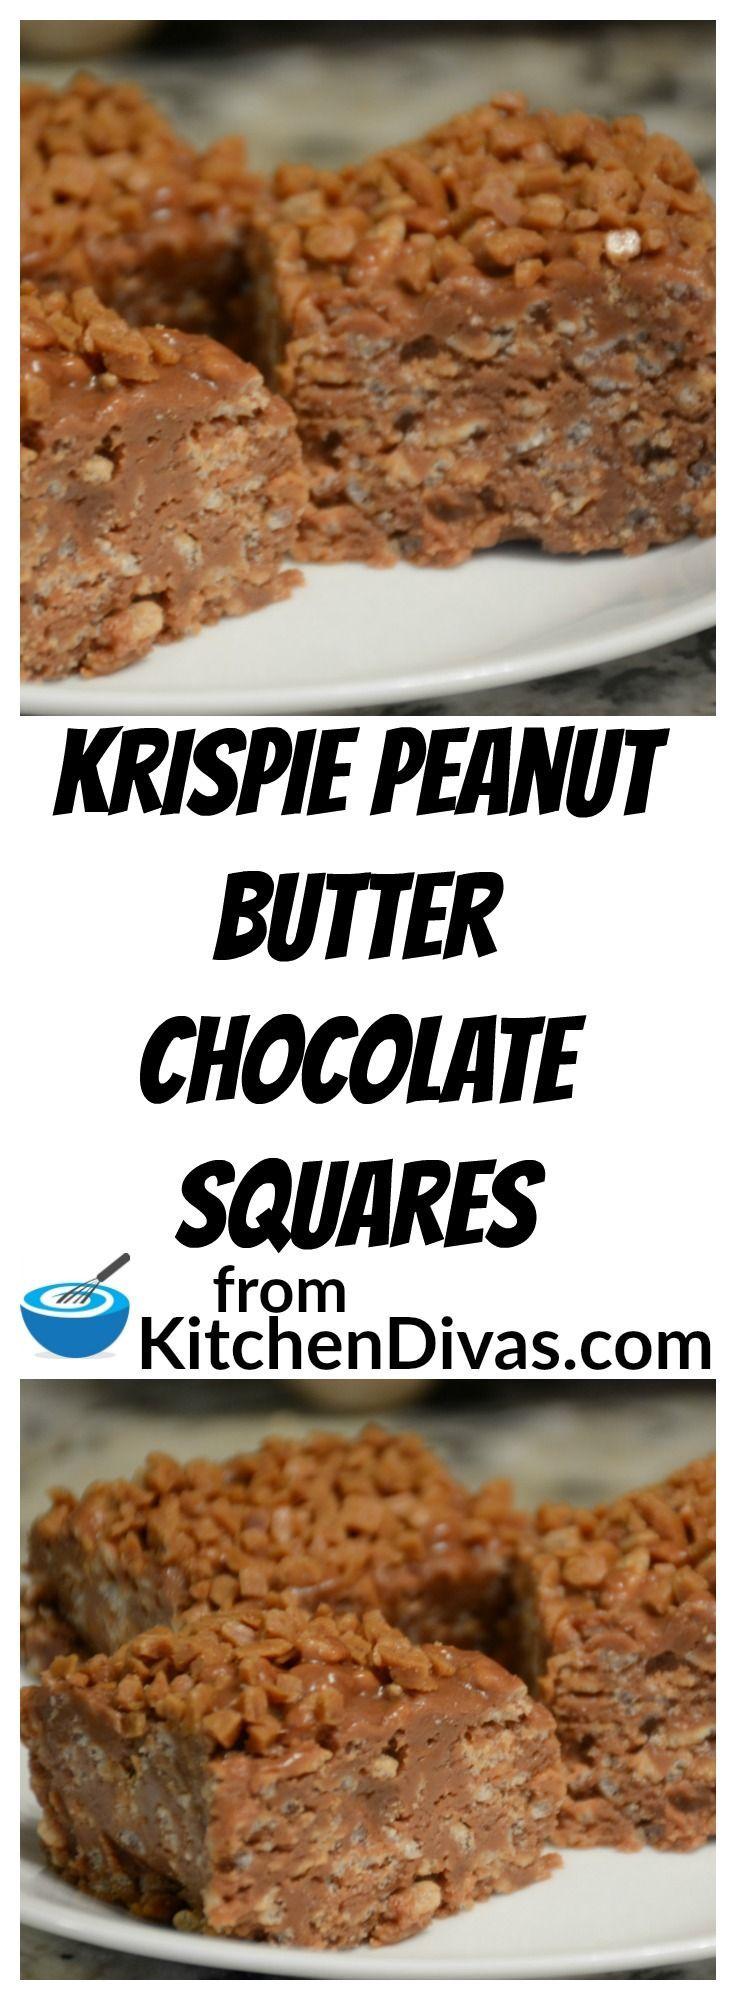 Krispie Peanut Butter Chocolate Squares